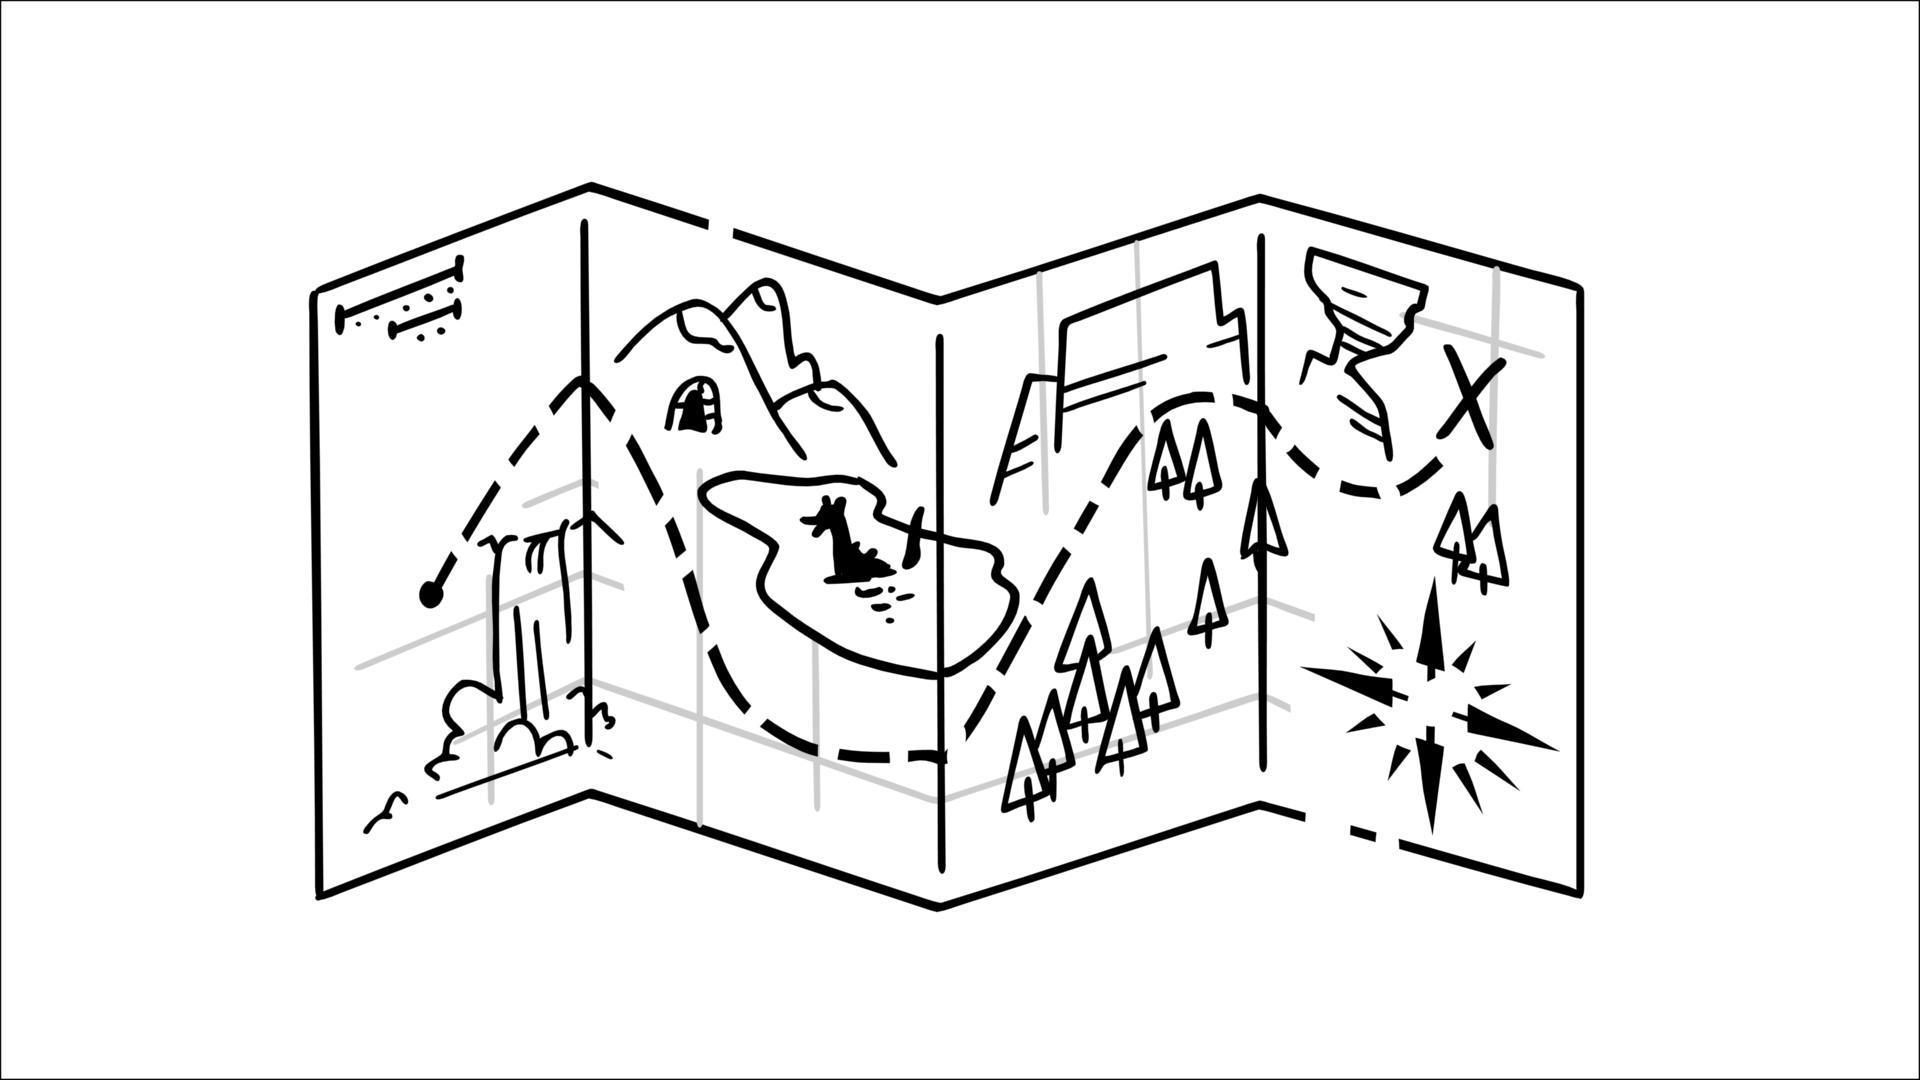 Cognizant_Storyboards_001-1-27.jpg